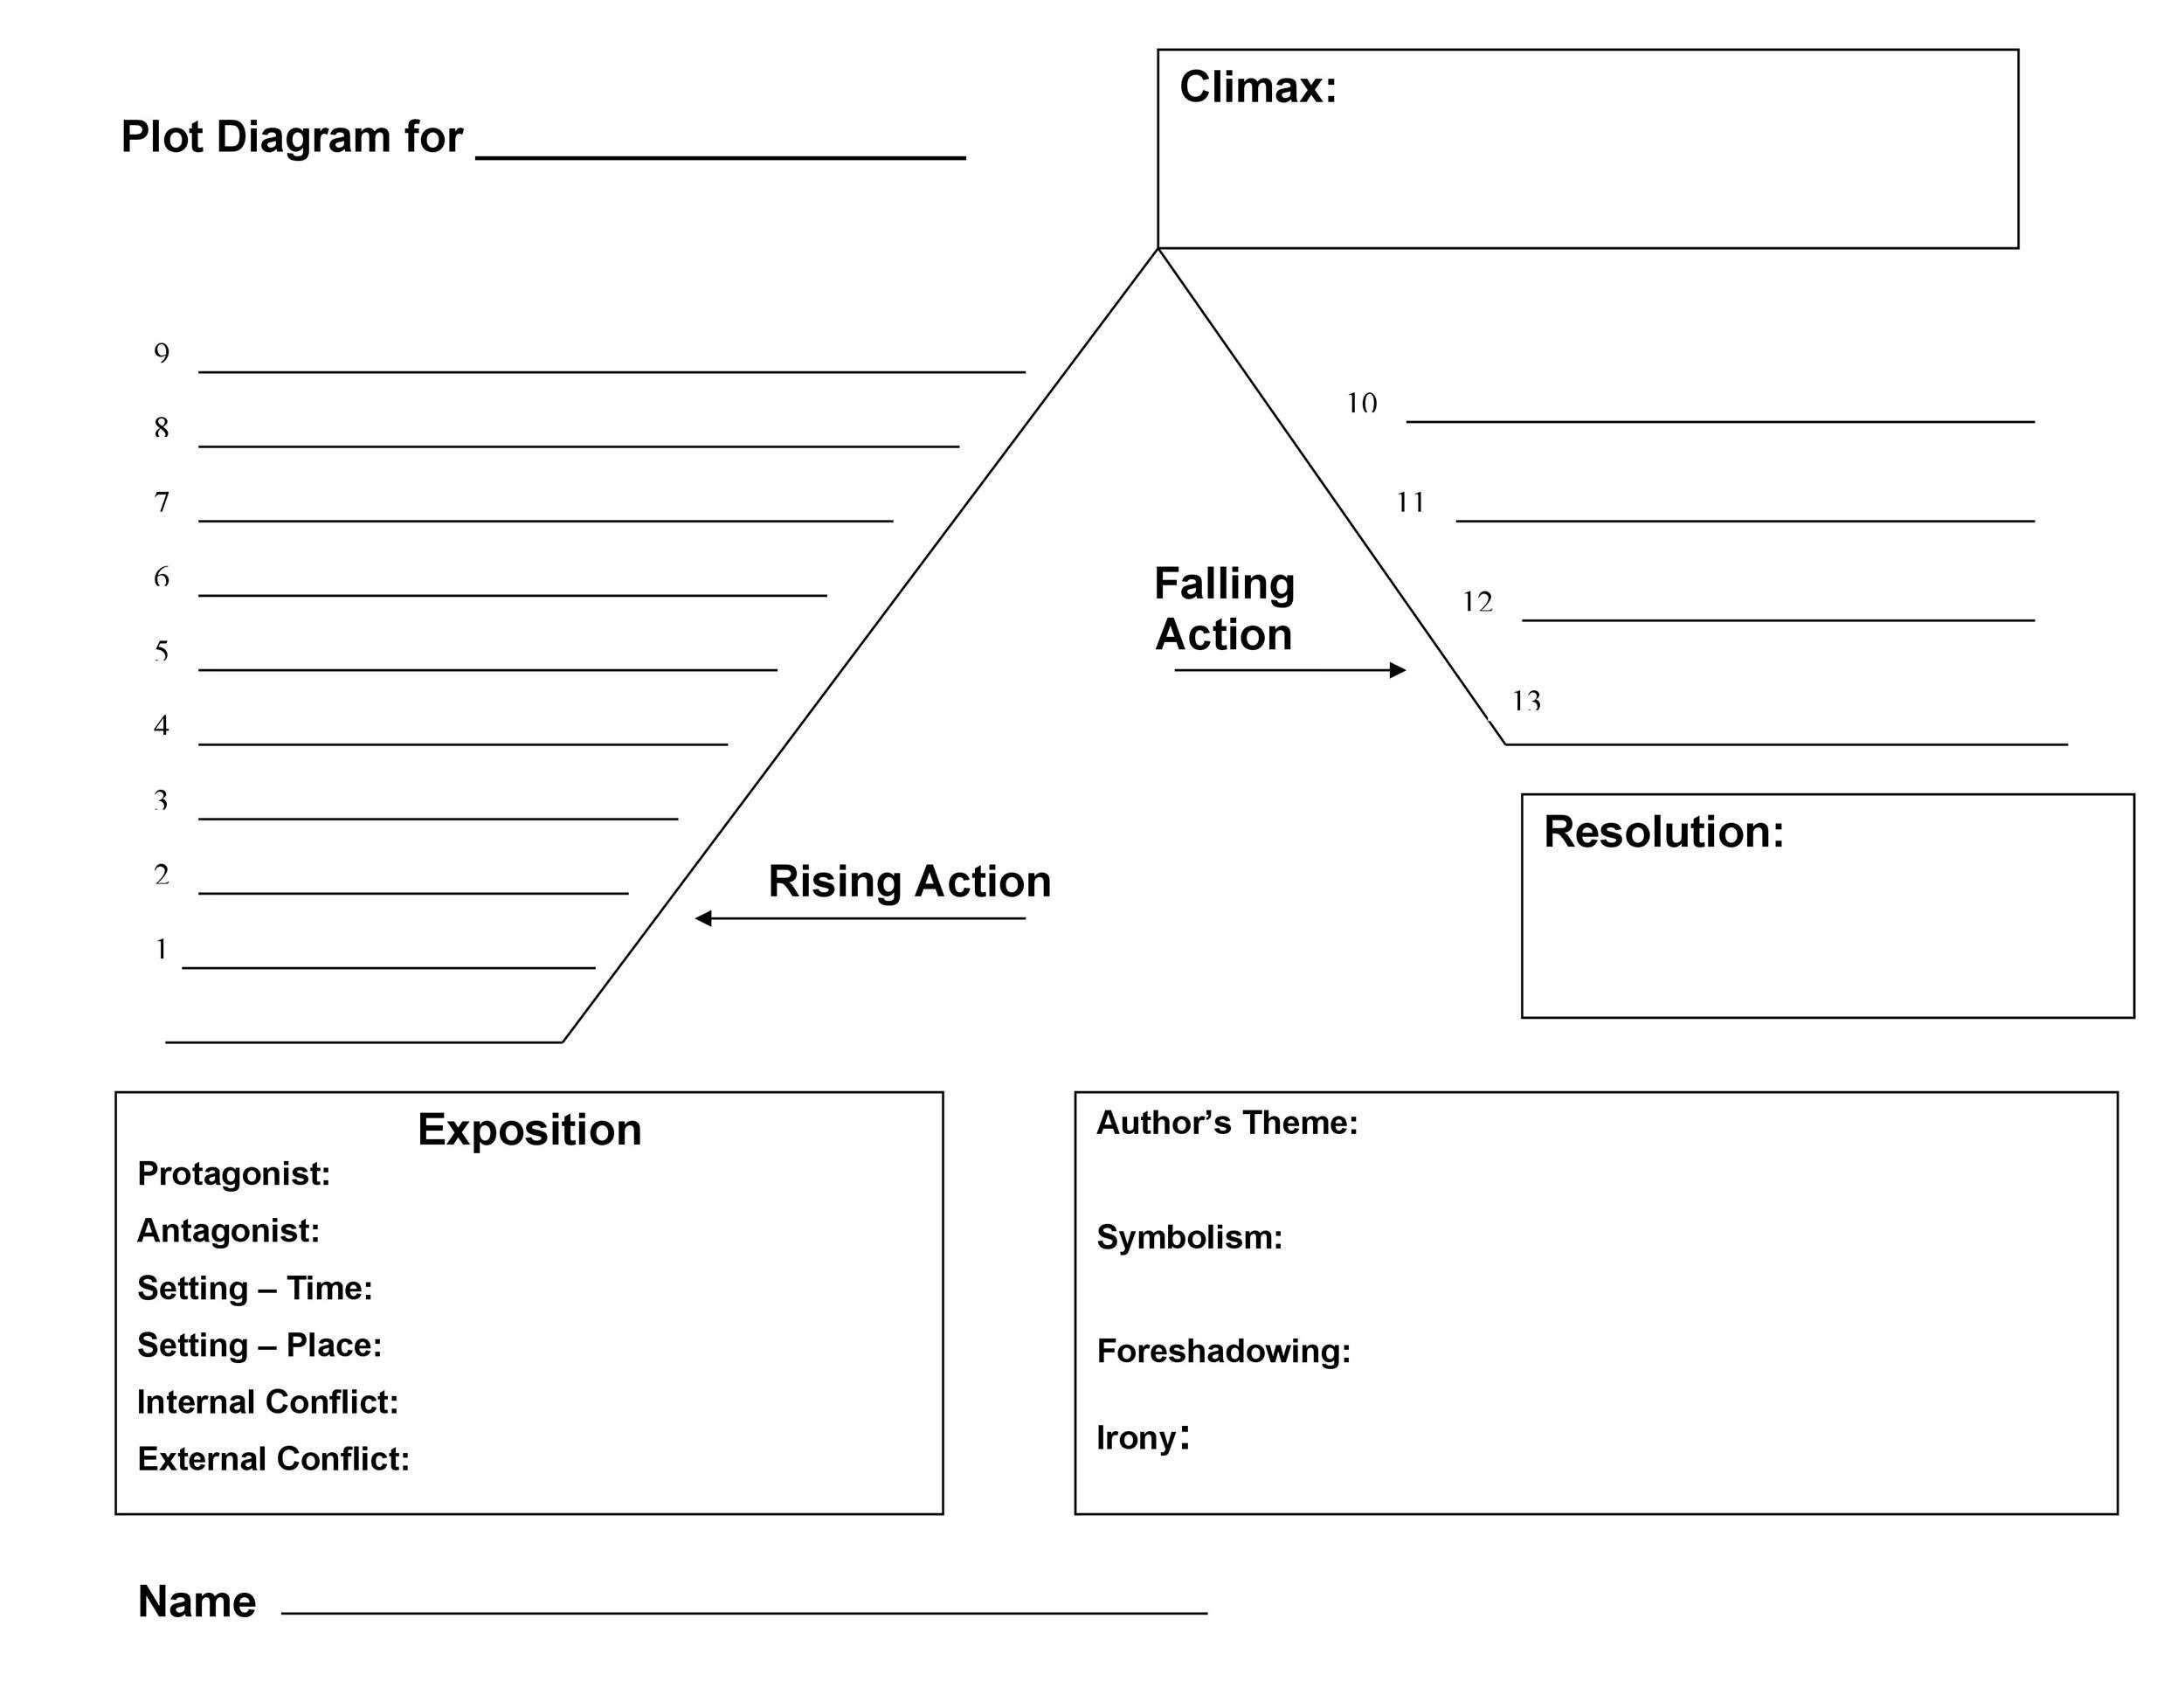 45 Professional Plot Diagram Templates Plot Pyramid Template Lab